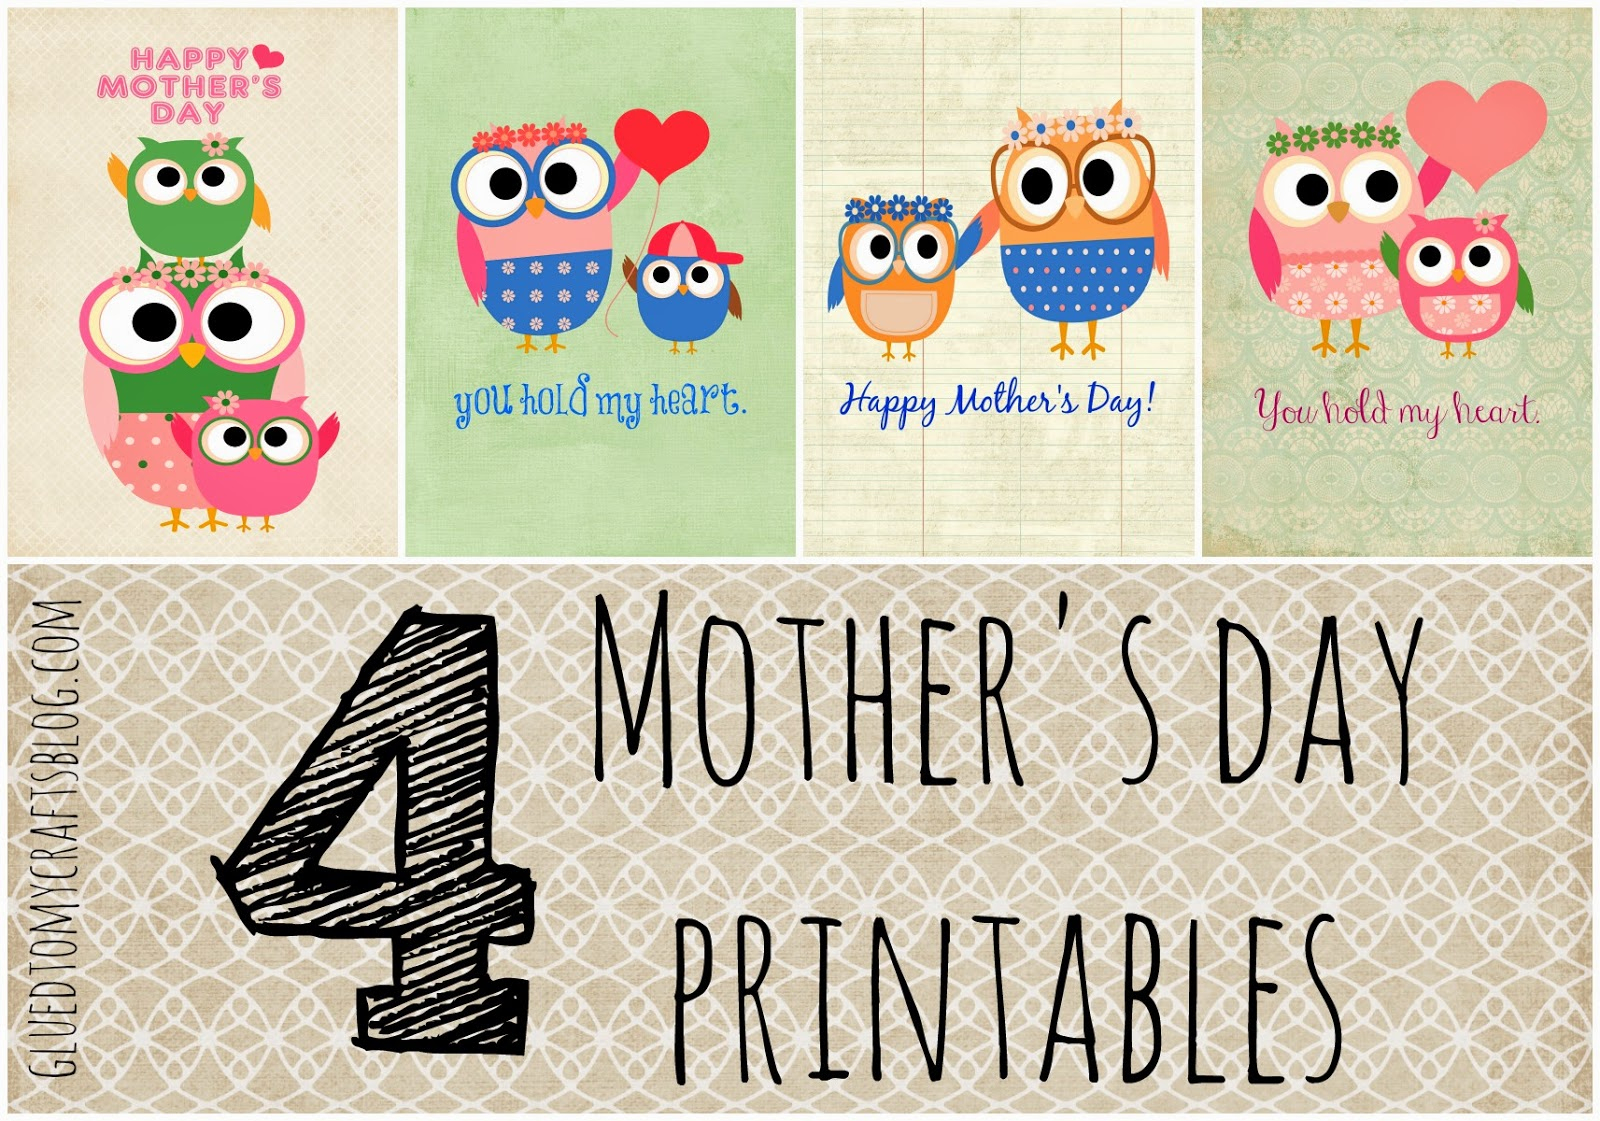 Free Printable Mother's Day Cards (Pdf) | Cisdem - Free Printable Mothers Day Cards To My Wife